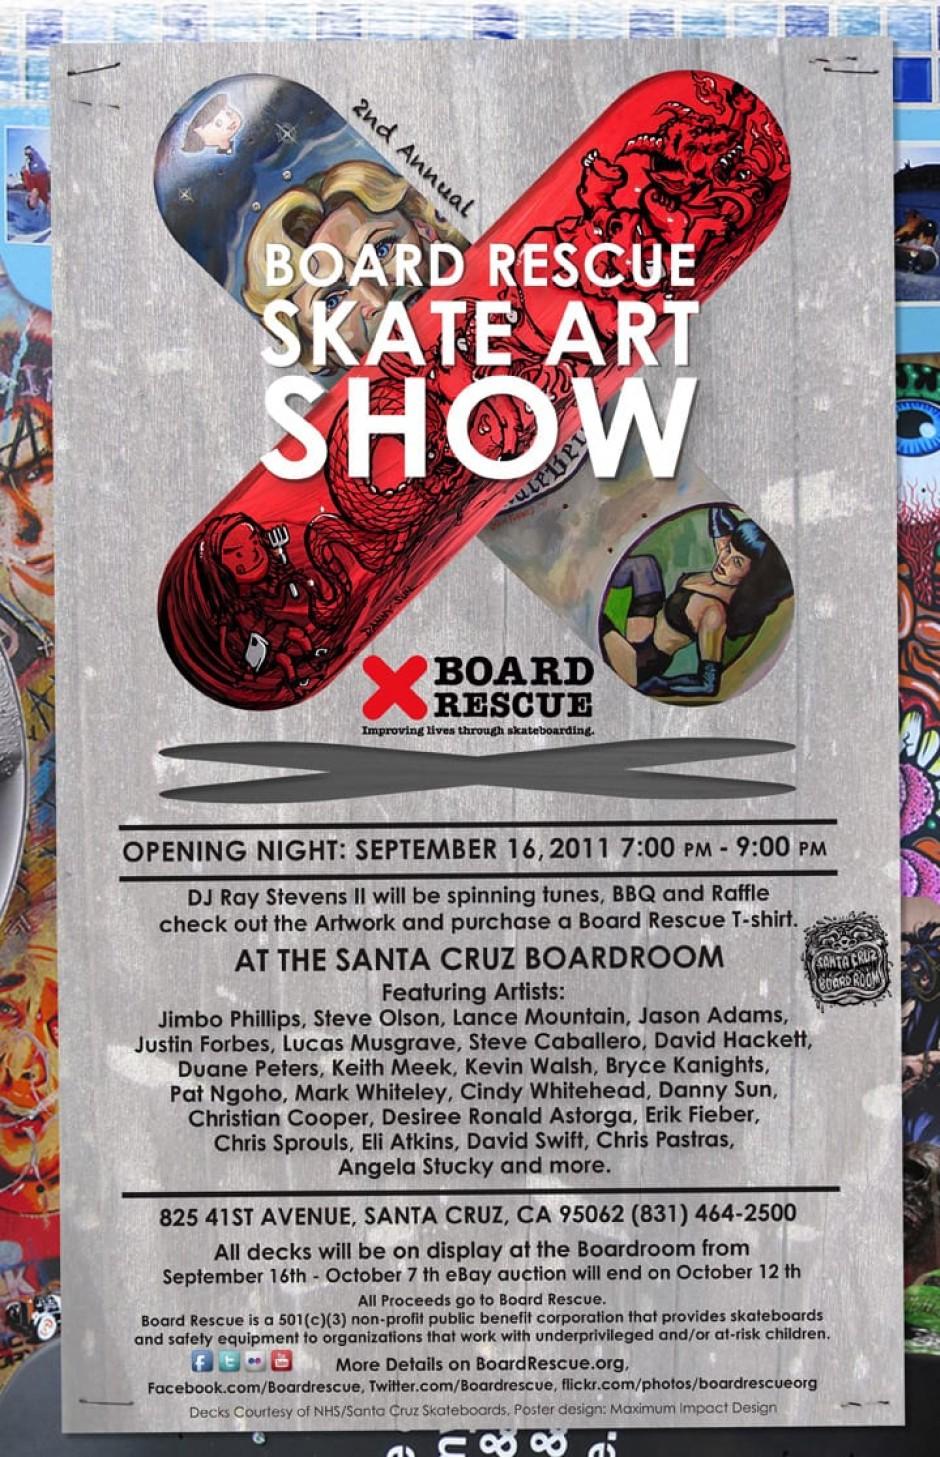 Board Rescue Skate Art Show